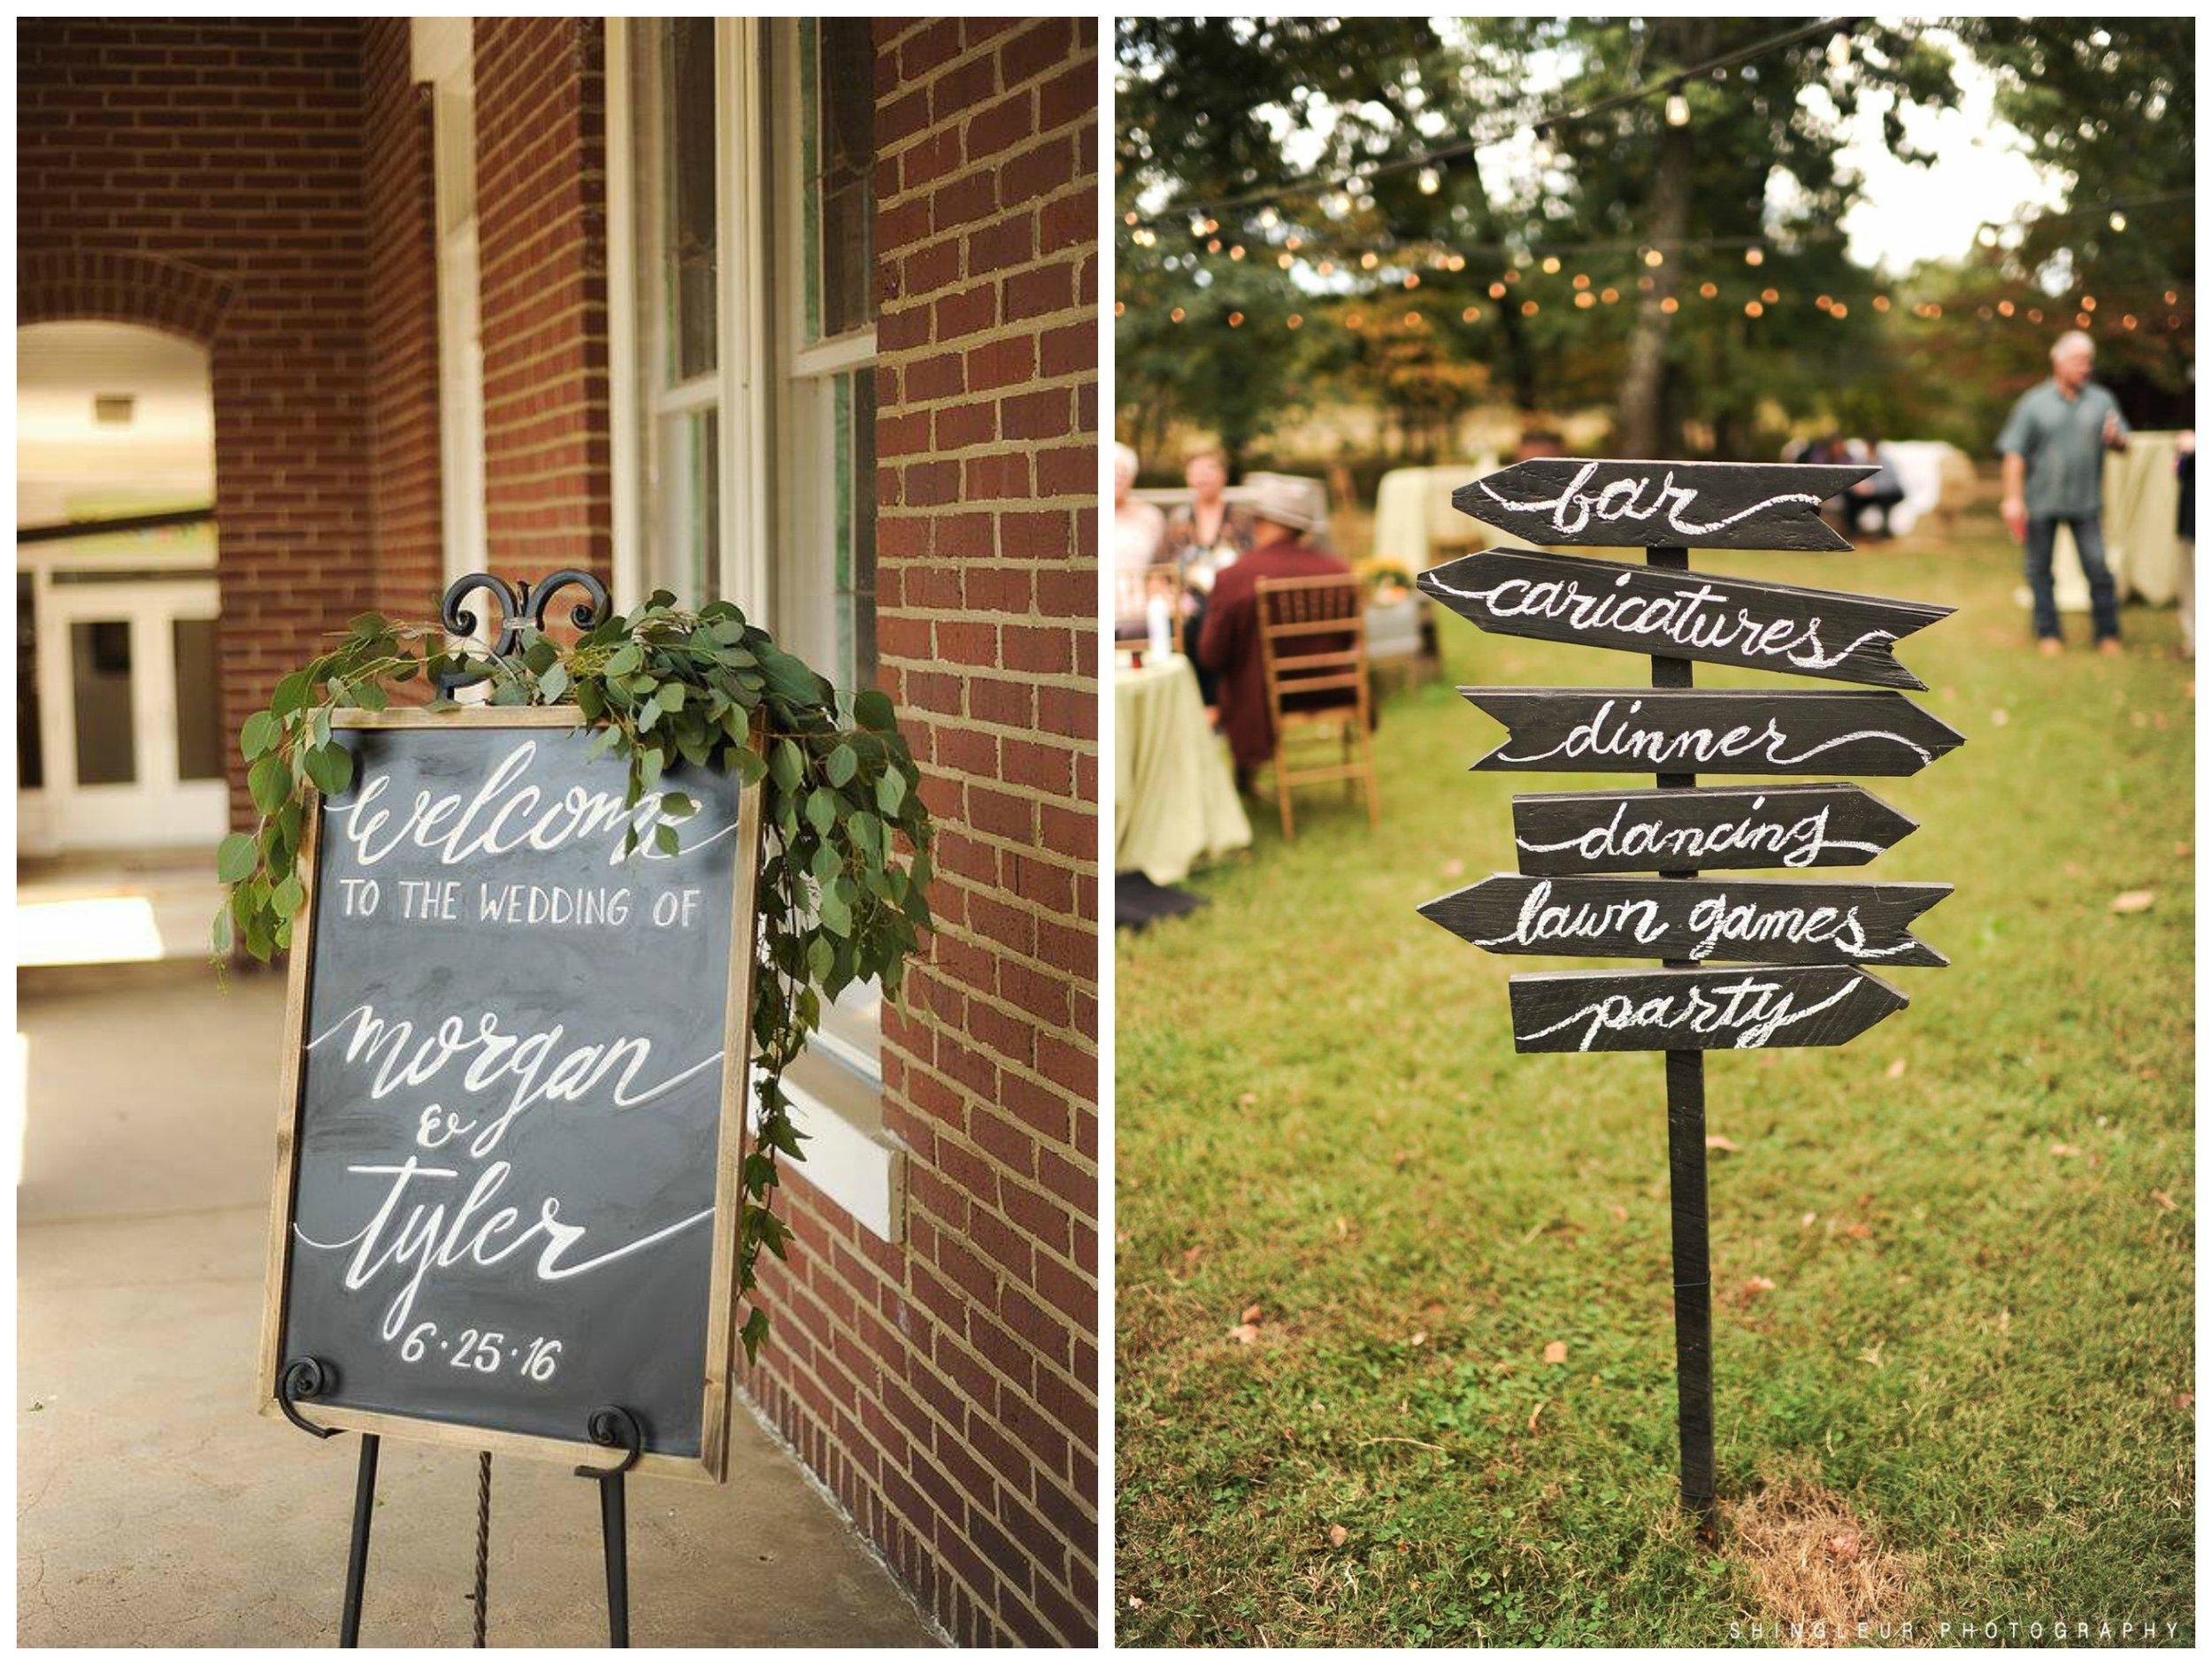 Shingleur Photography , from  Morgan + Tyler 's wedding and  Mandy + Matt 's wedding